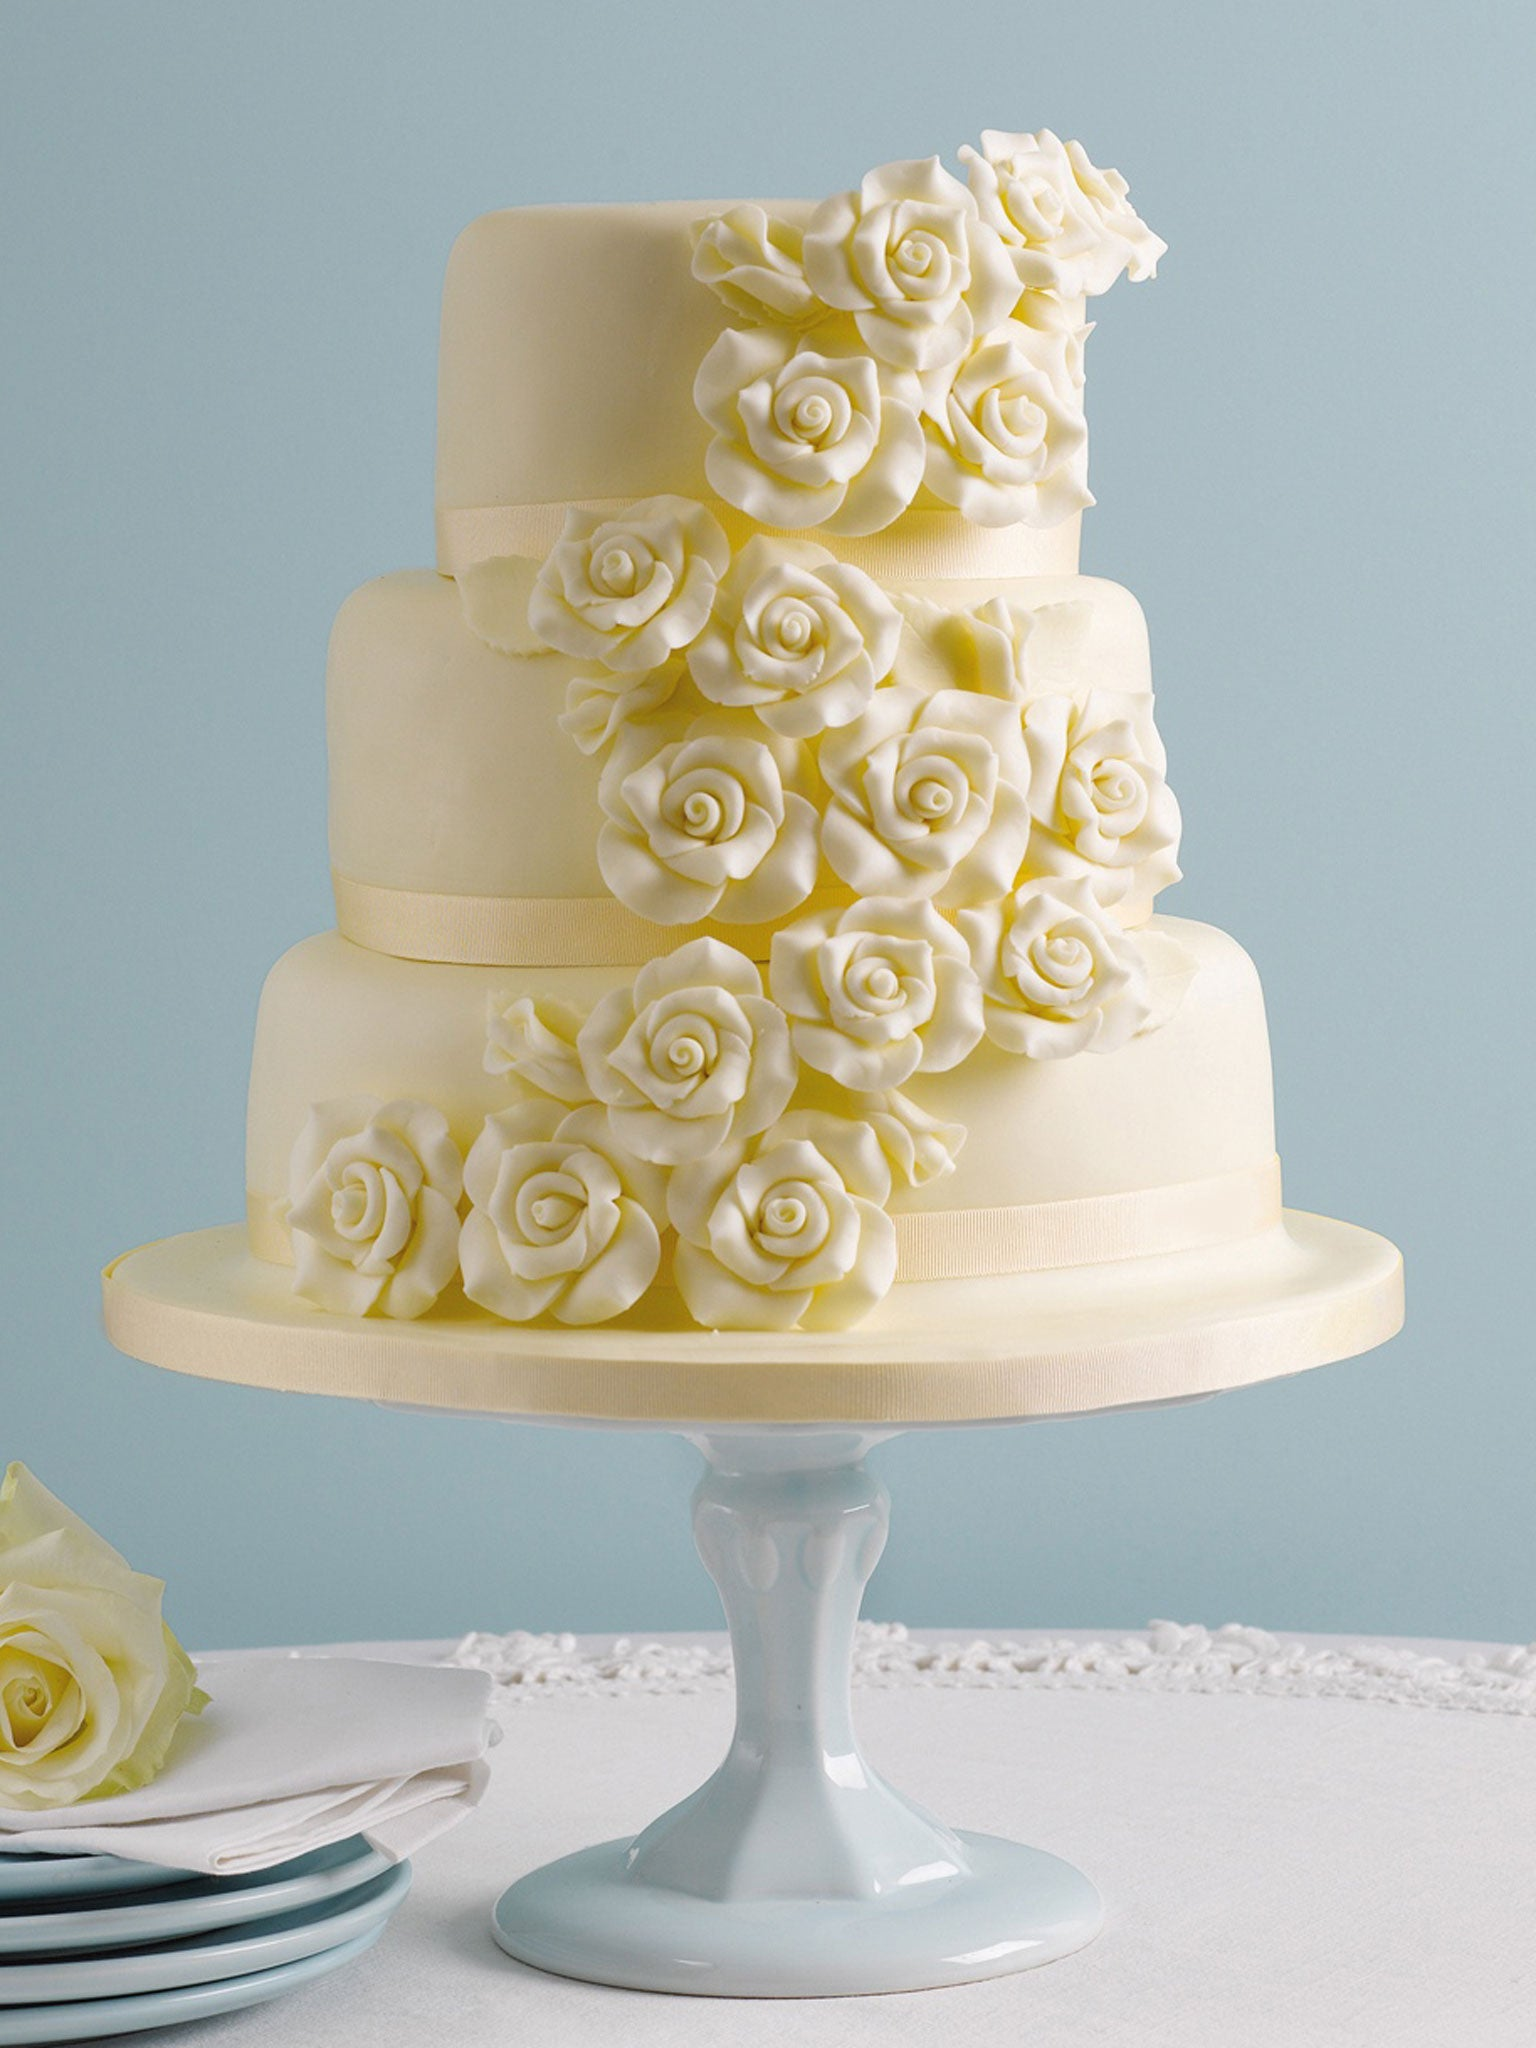 The 10 best wedding cakes the independent tenbest3g junglespirit Gallery